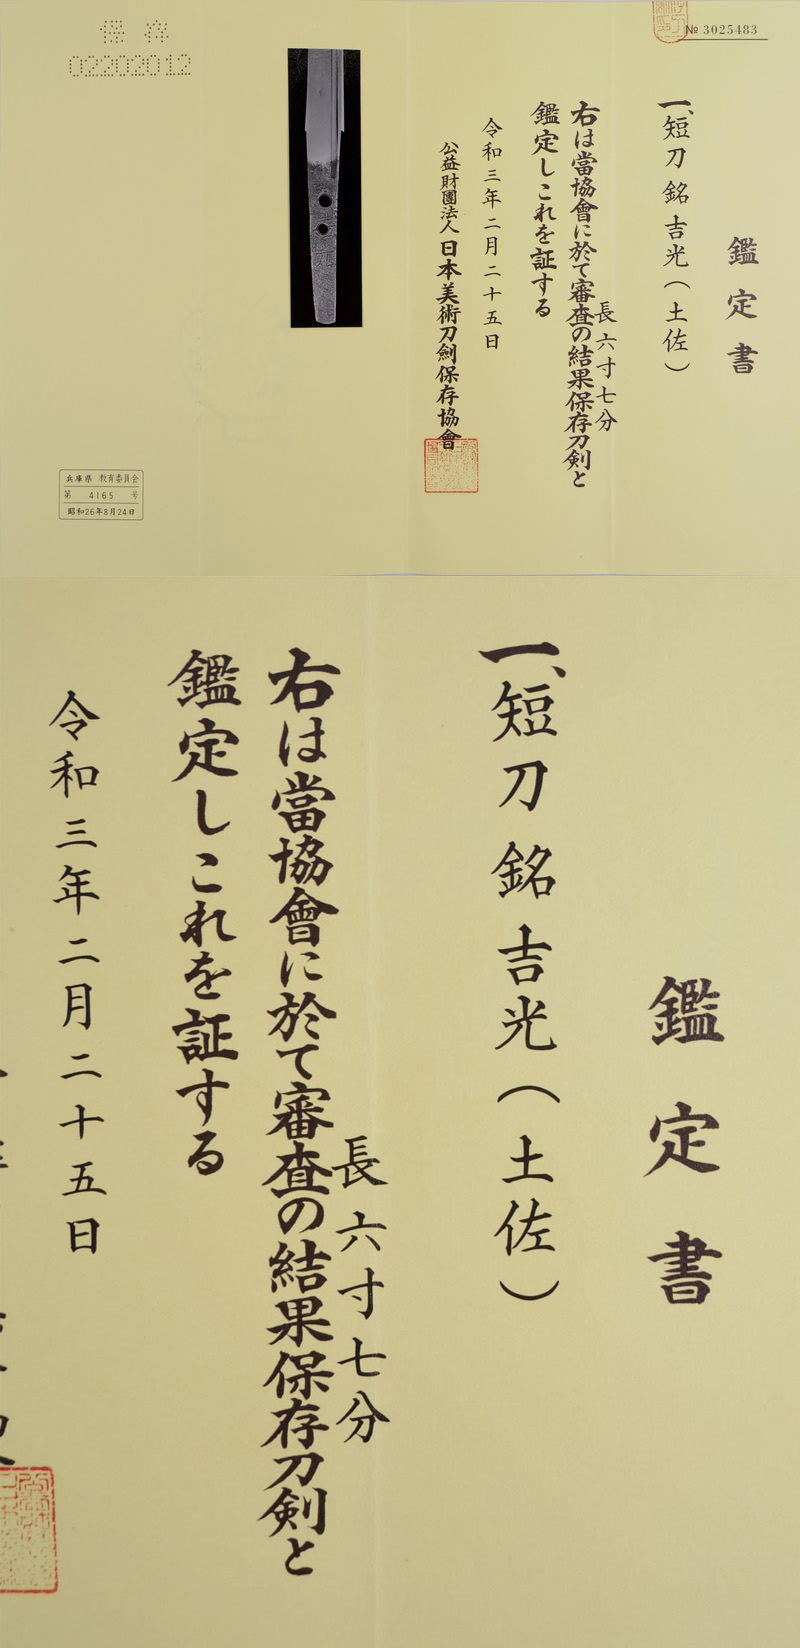 短刀 吉光(土佐) Picture of Certificate